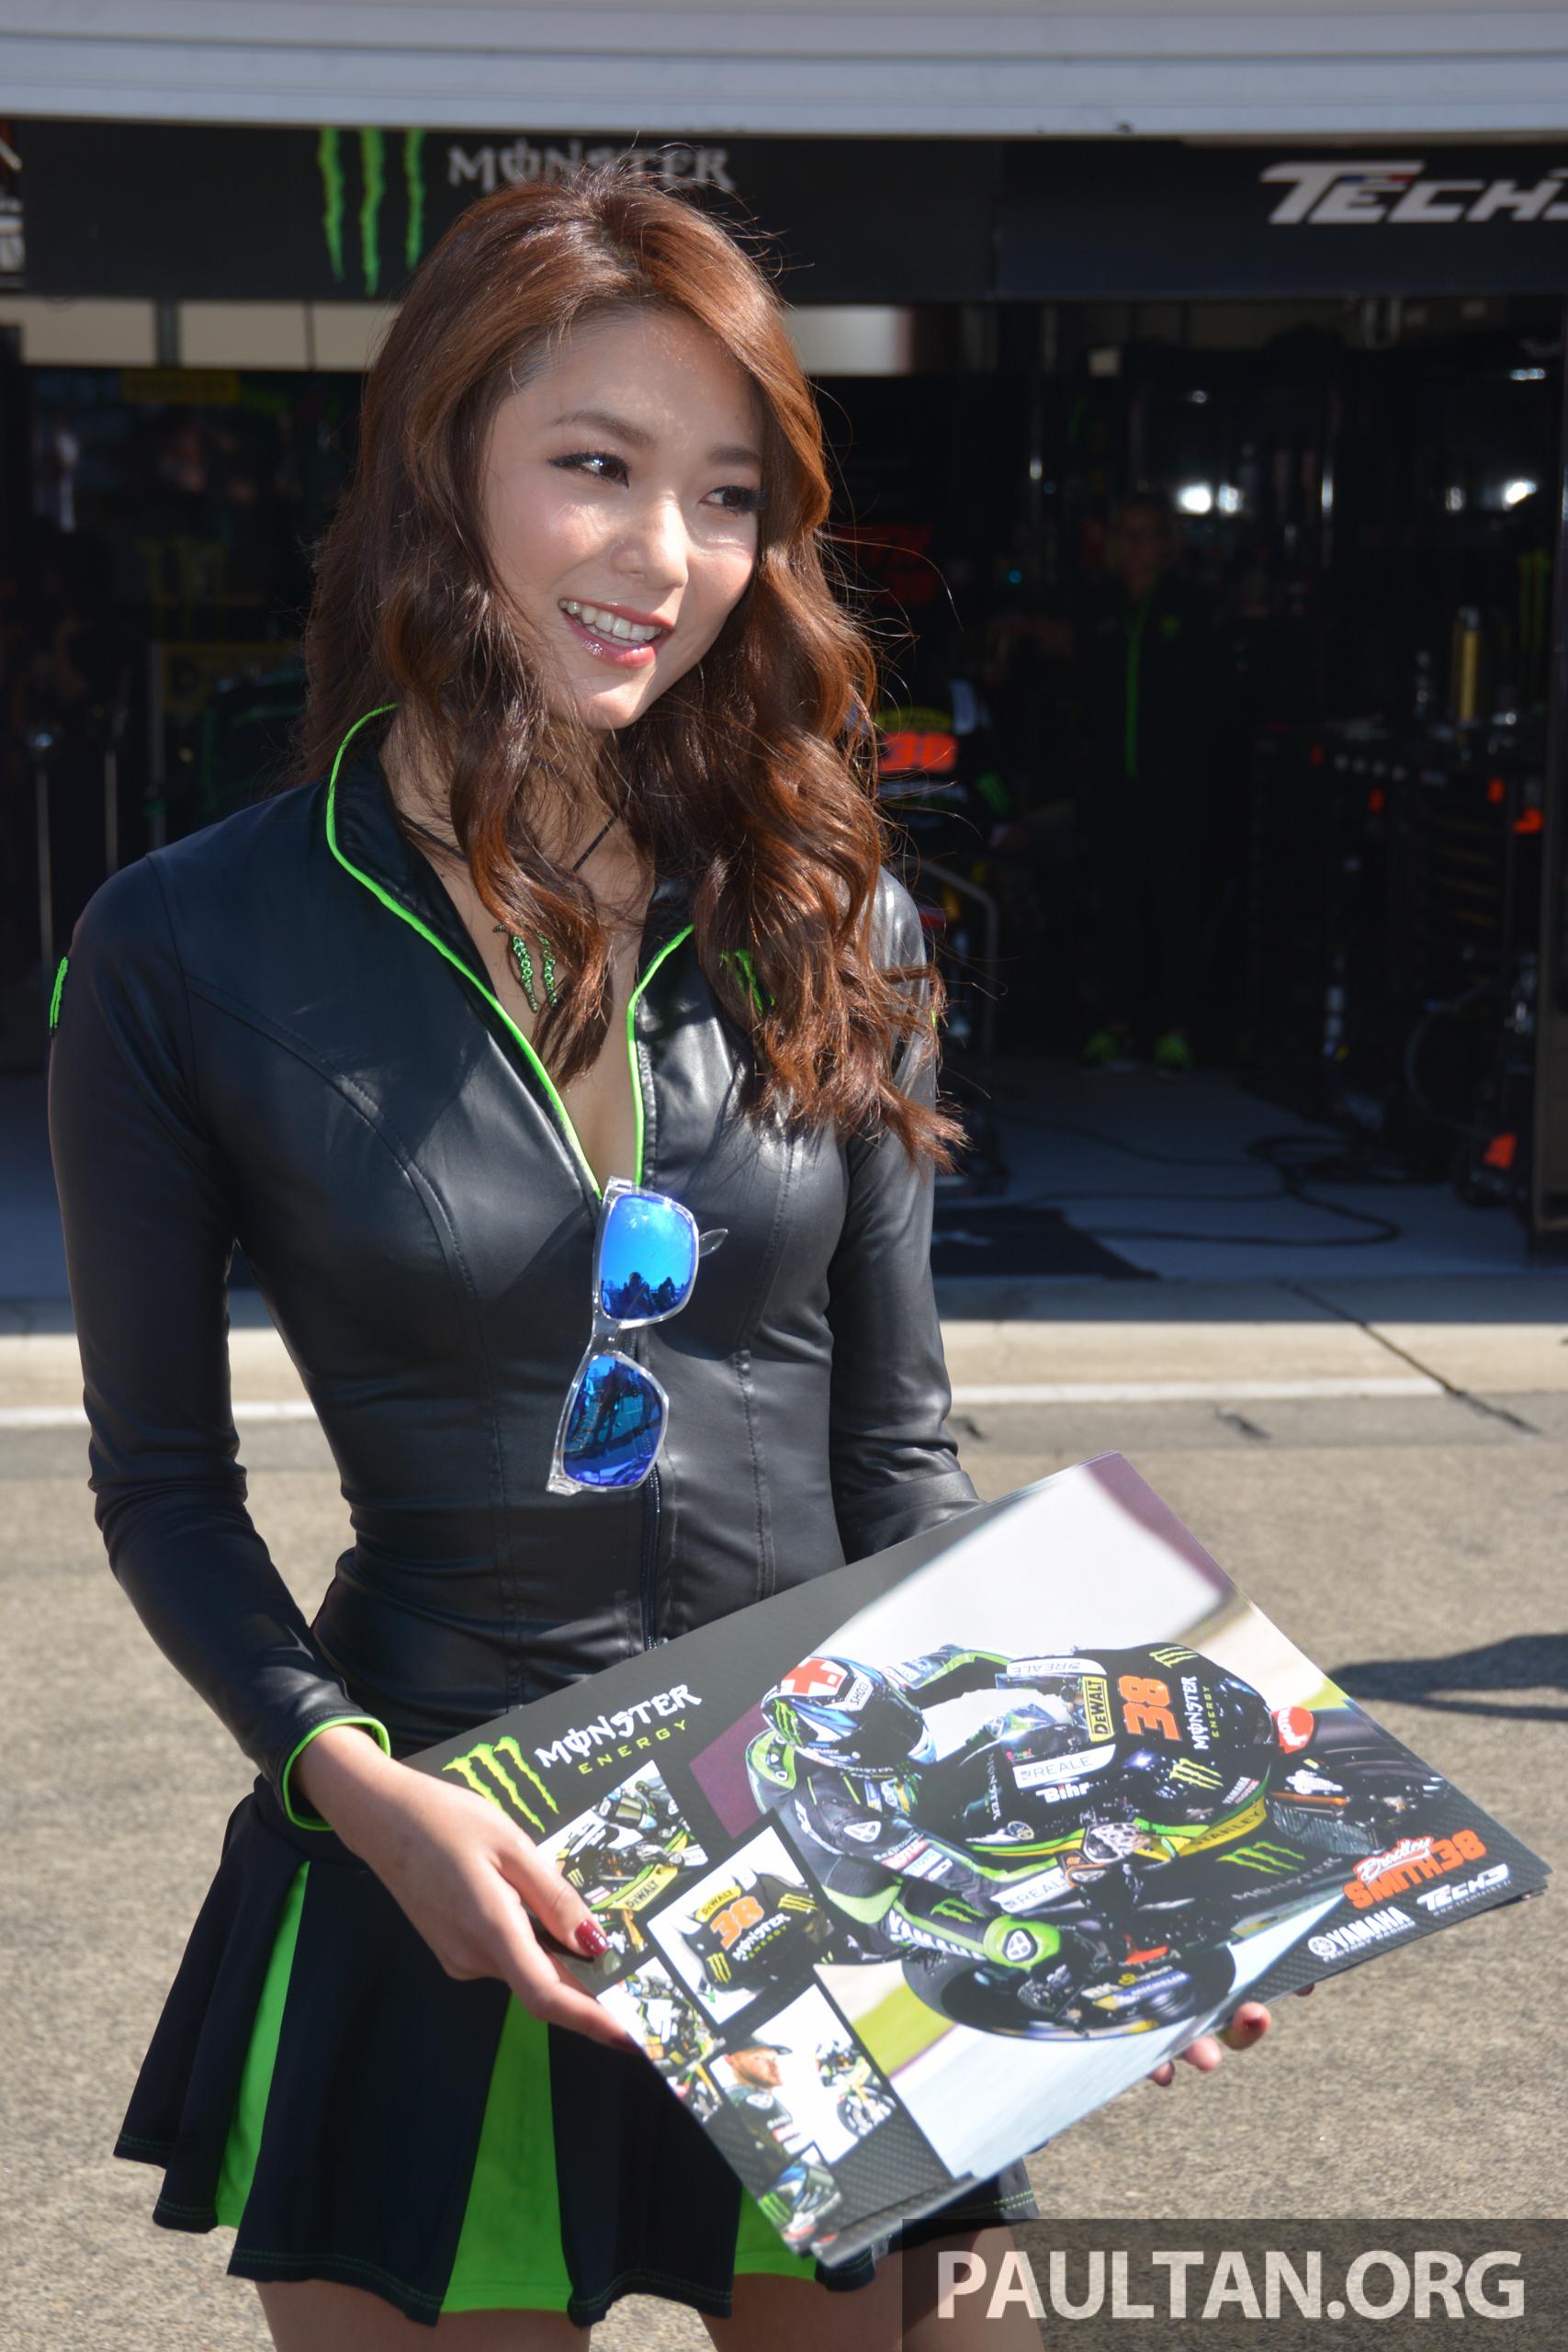 Motul Grand Prix Of Japan Motogp | MotoGP 2017 Info, Video, Points Table